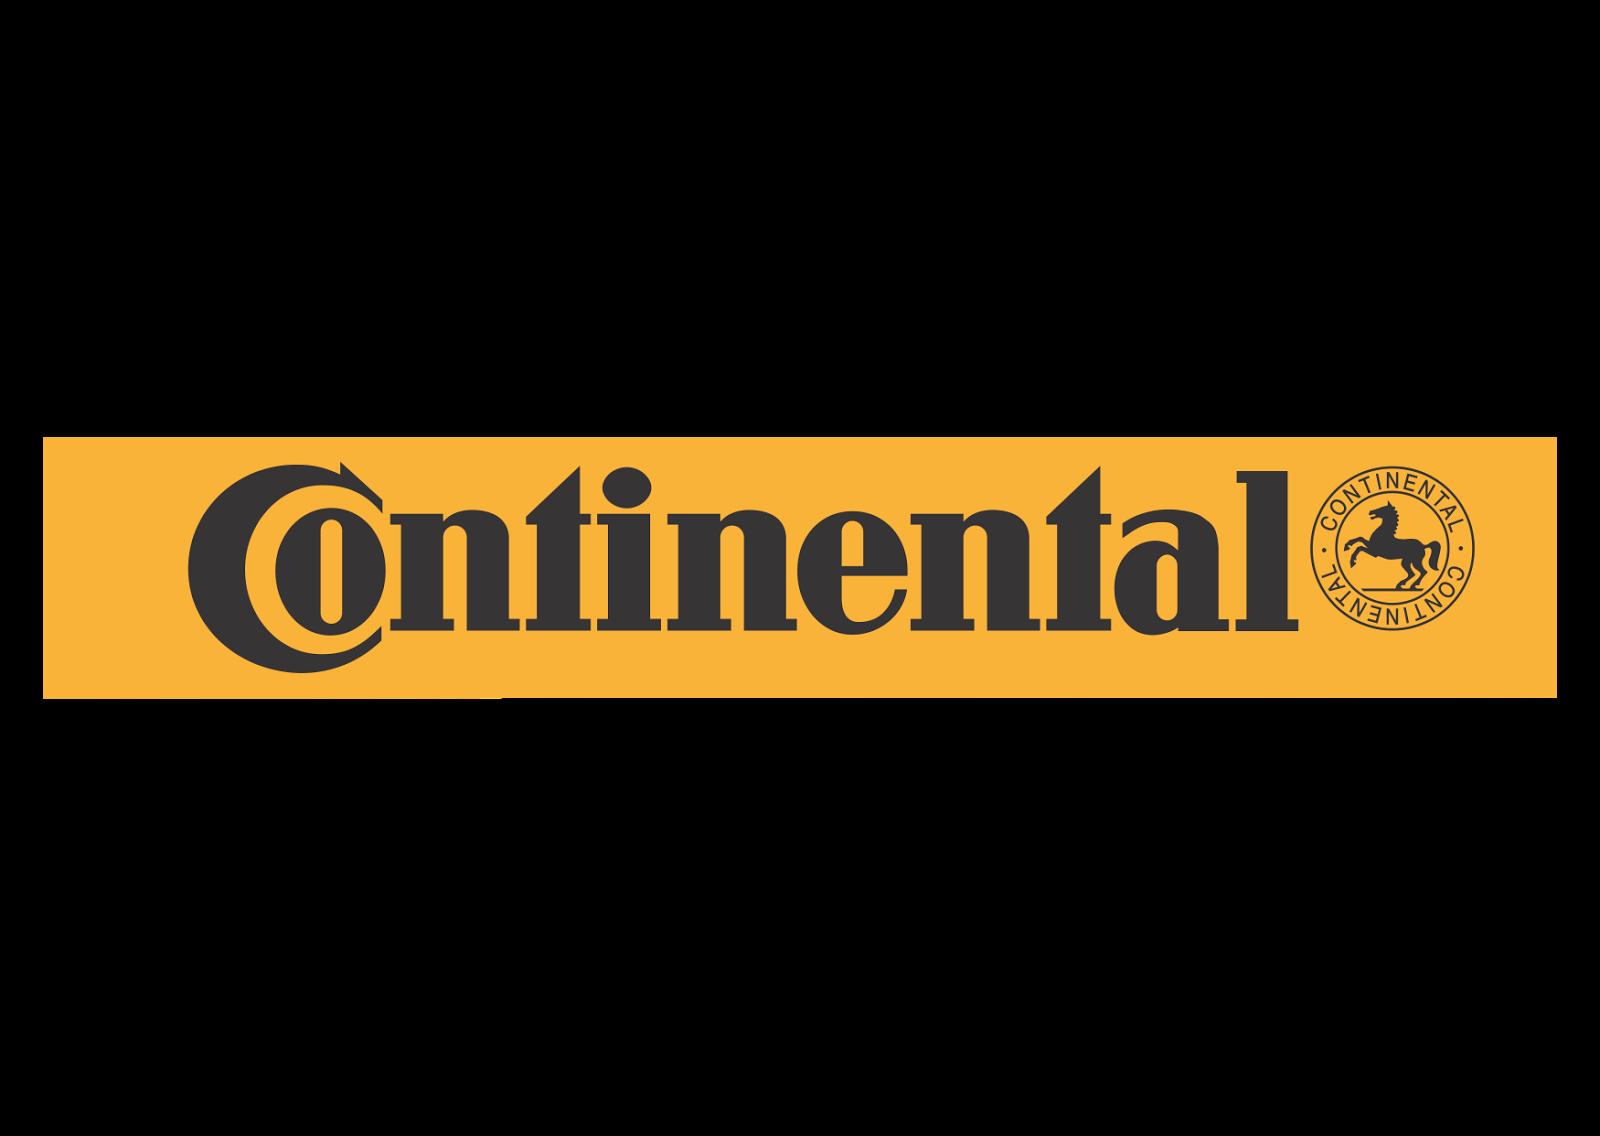 Continental Tires Logo Vector Png - Continental Logo Vector, Transparent background PNG HD thumbnail